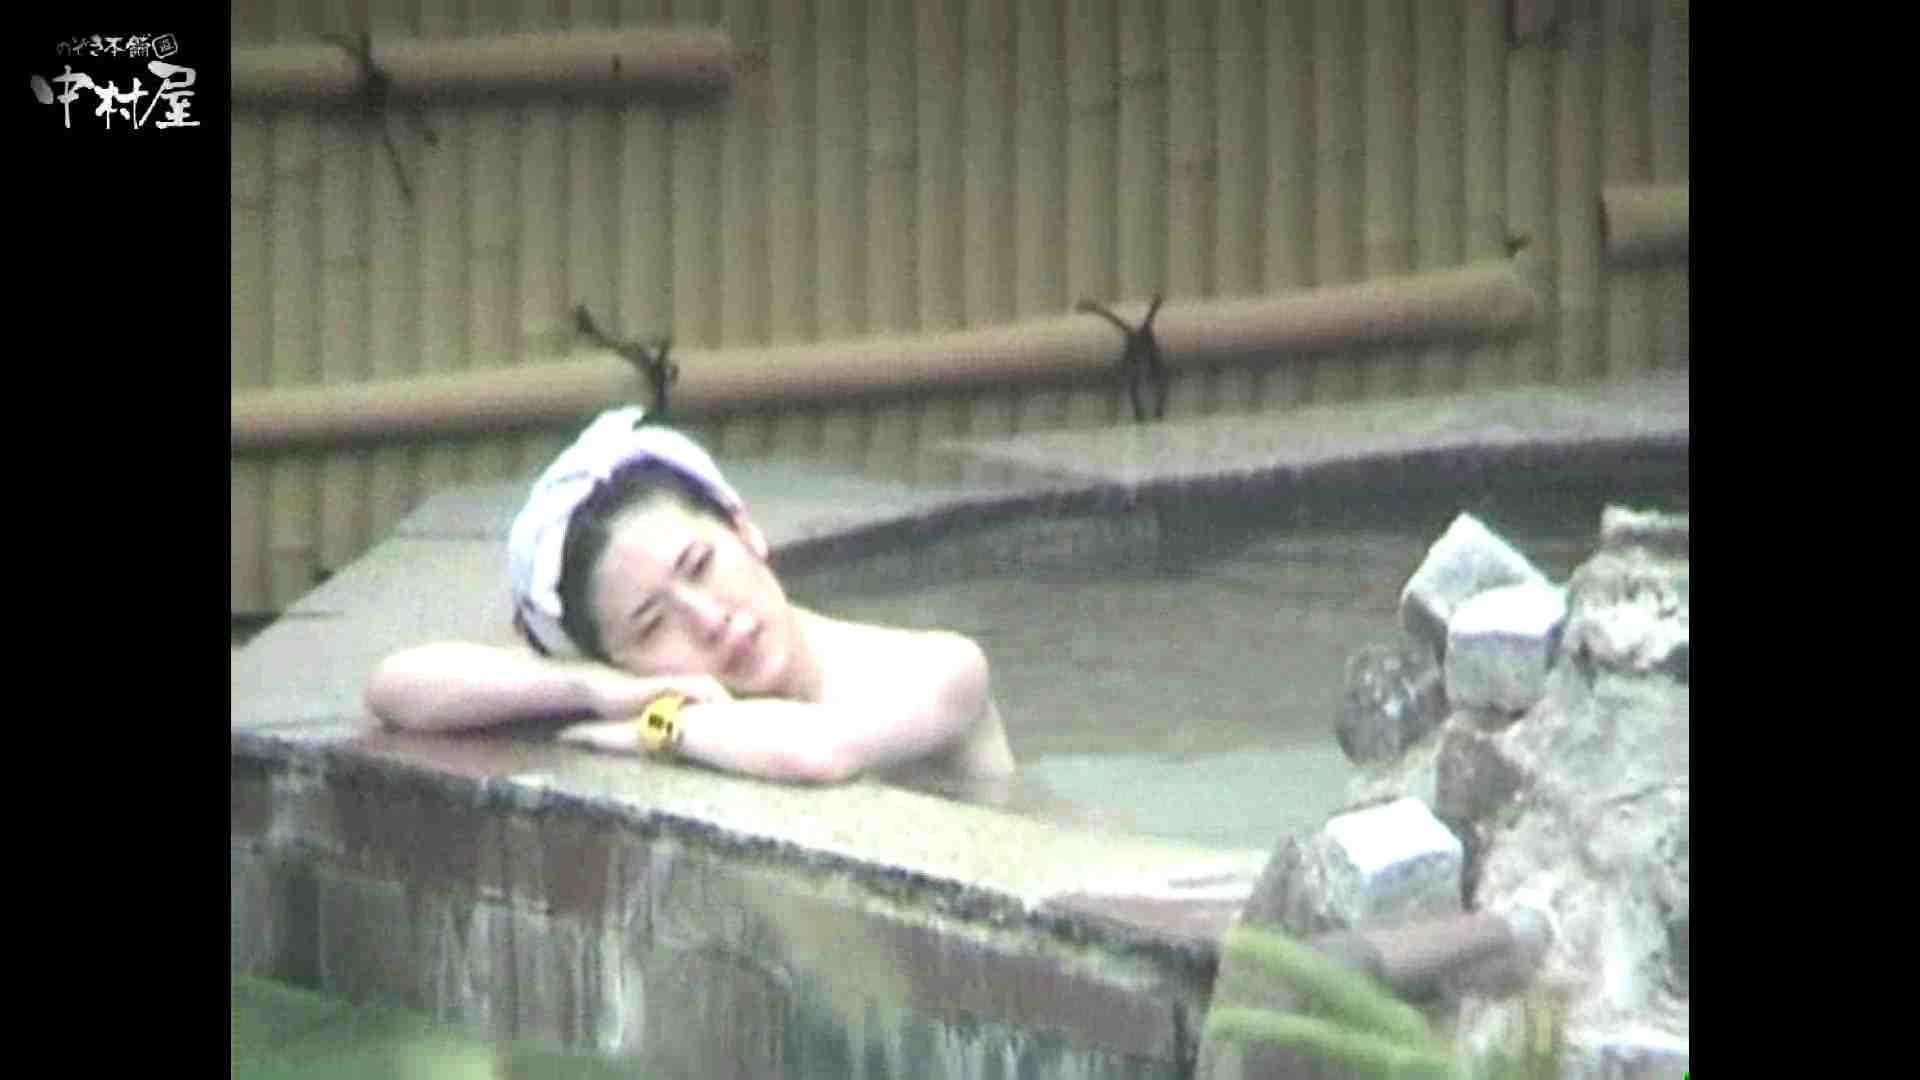 Aquaな露天風呂Vol.874潜入盗撮露天風呂十判湯 其の四 潜入  108画像 36